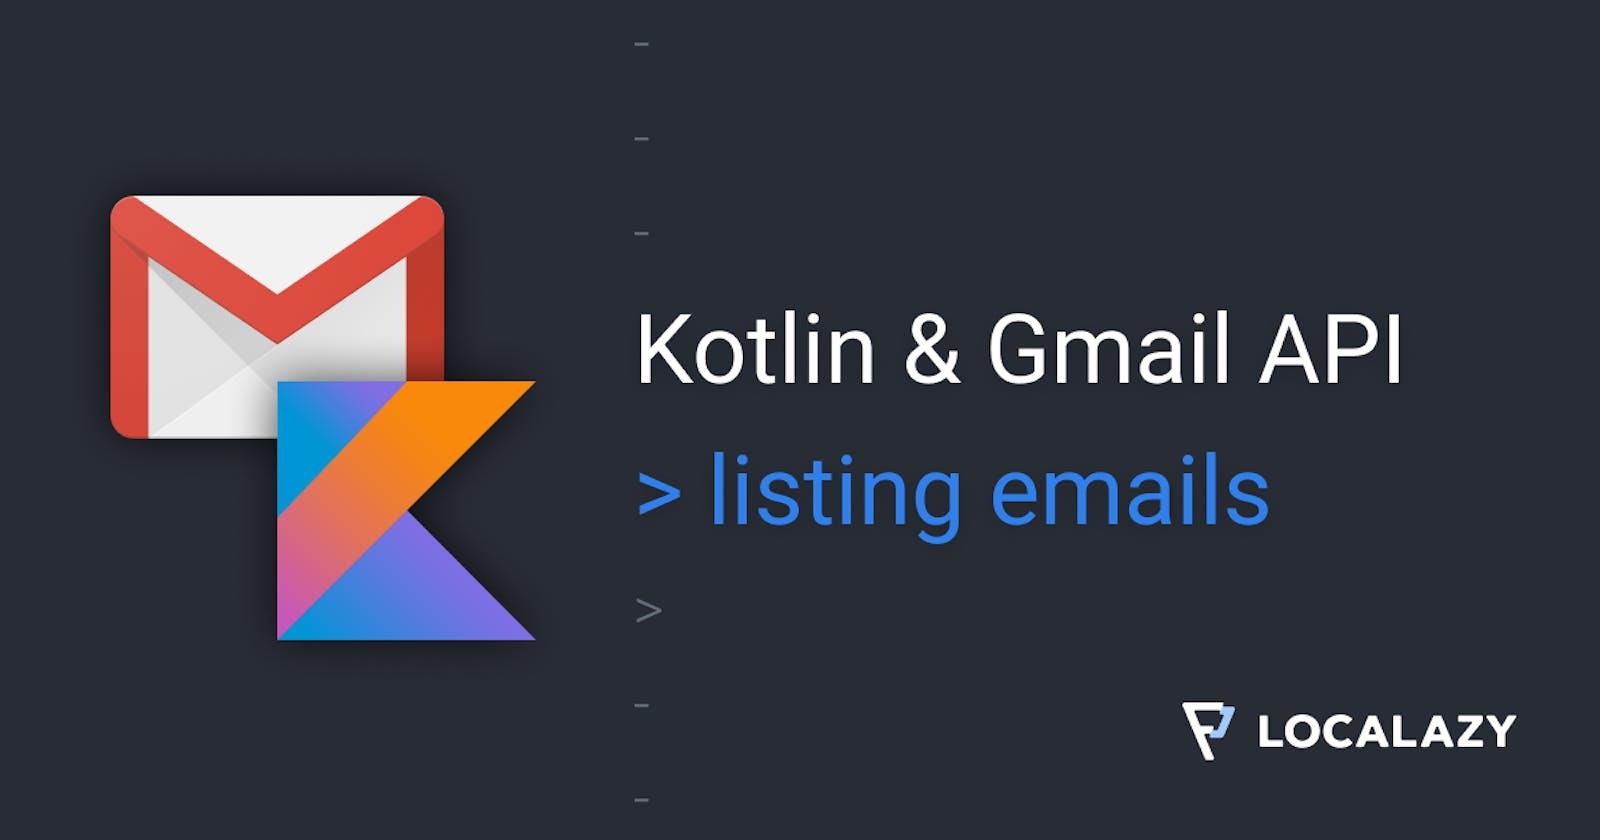 Kotlin & Gmail API - listing emails